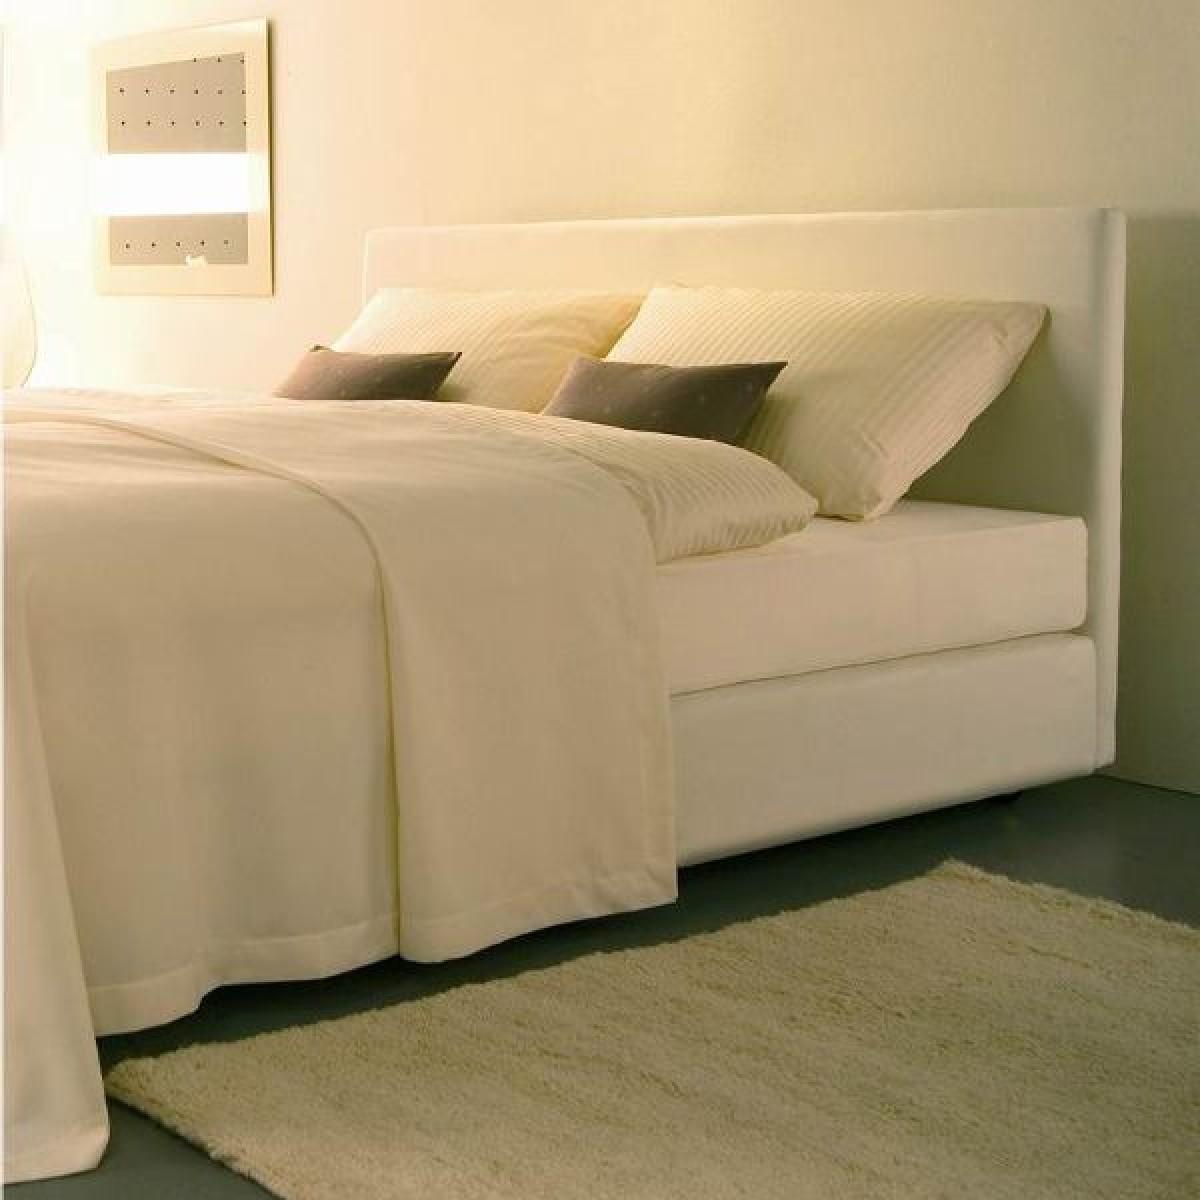 Full Size of Bett 160x200 Komplett Fbf Savoy Classic Hotel Boxspringbett Betten überlänge Chesterfield Luxus Kopfteil 140 Massivholz Kingsize Schlafzimmer Amerikanisches Bett Bett 160x200 Komplett